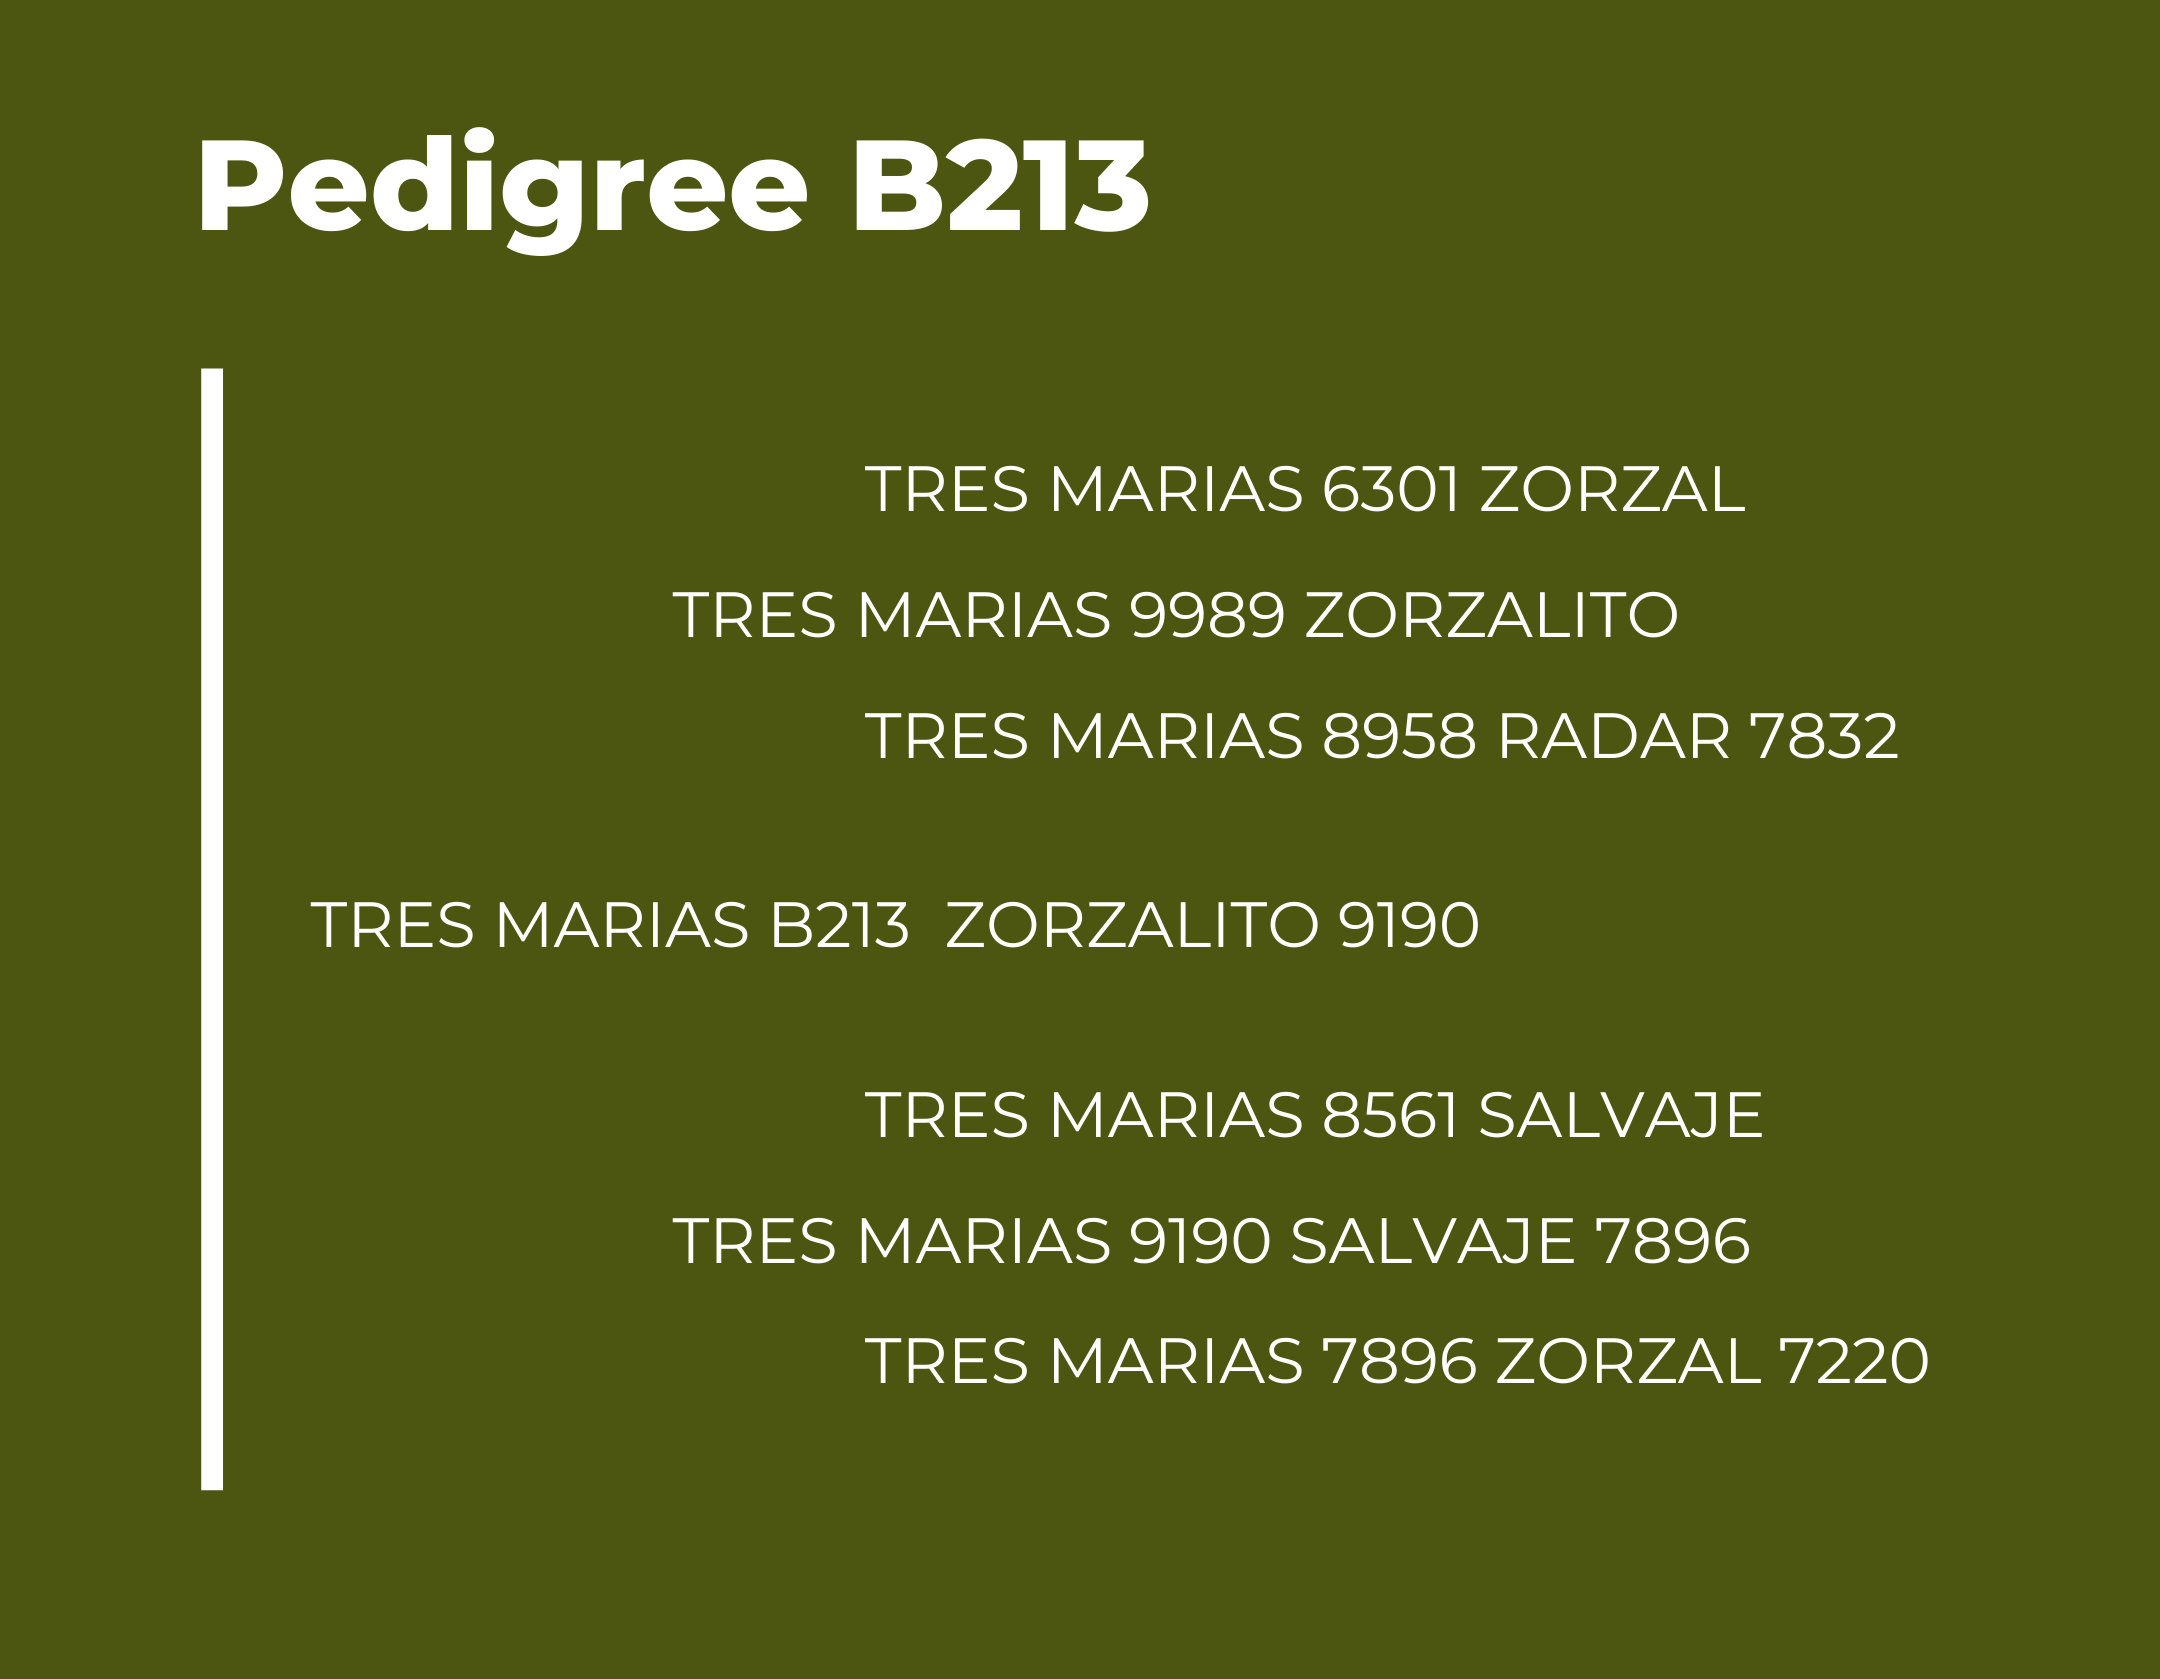 Pedigree Tres Marias B213